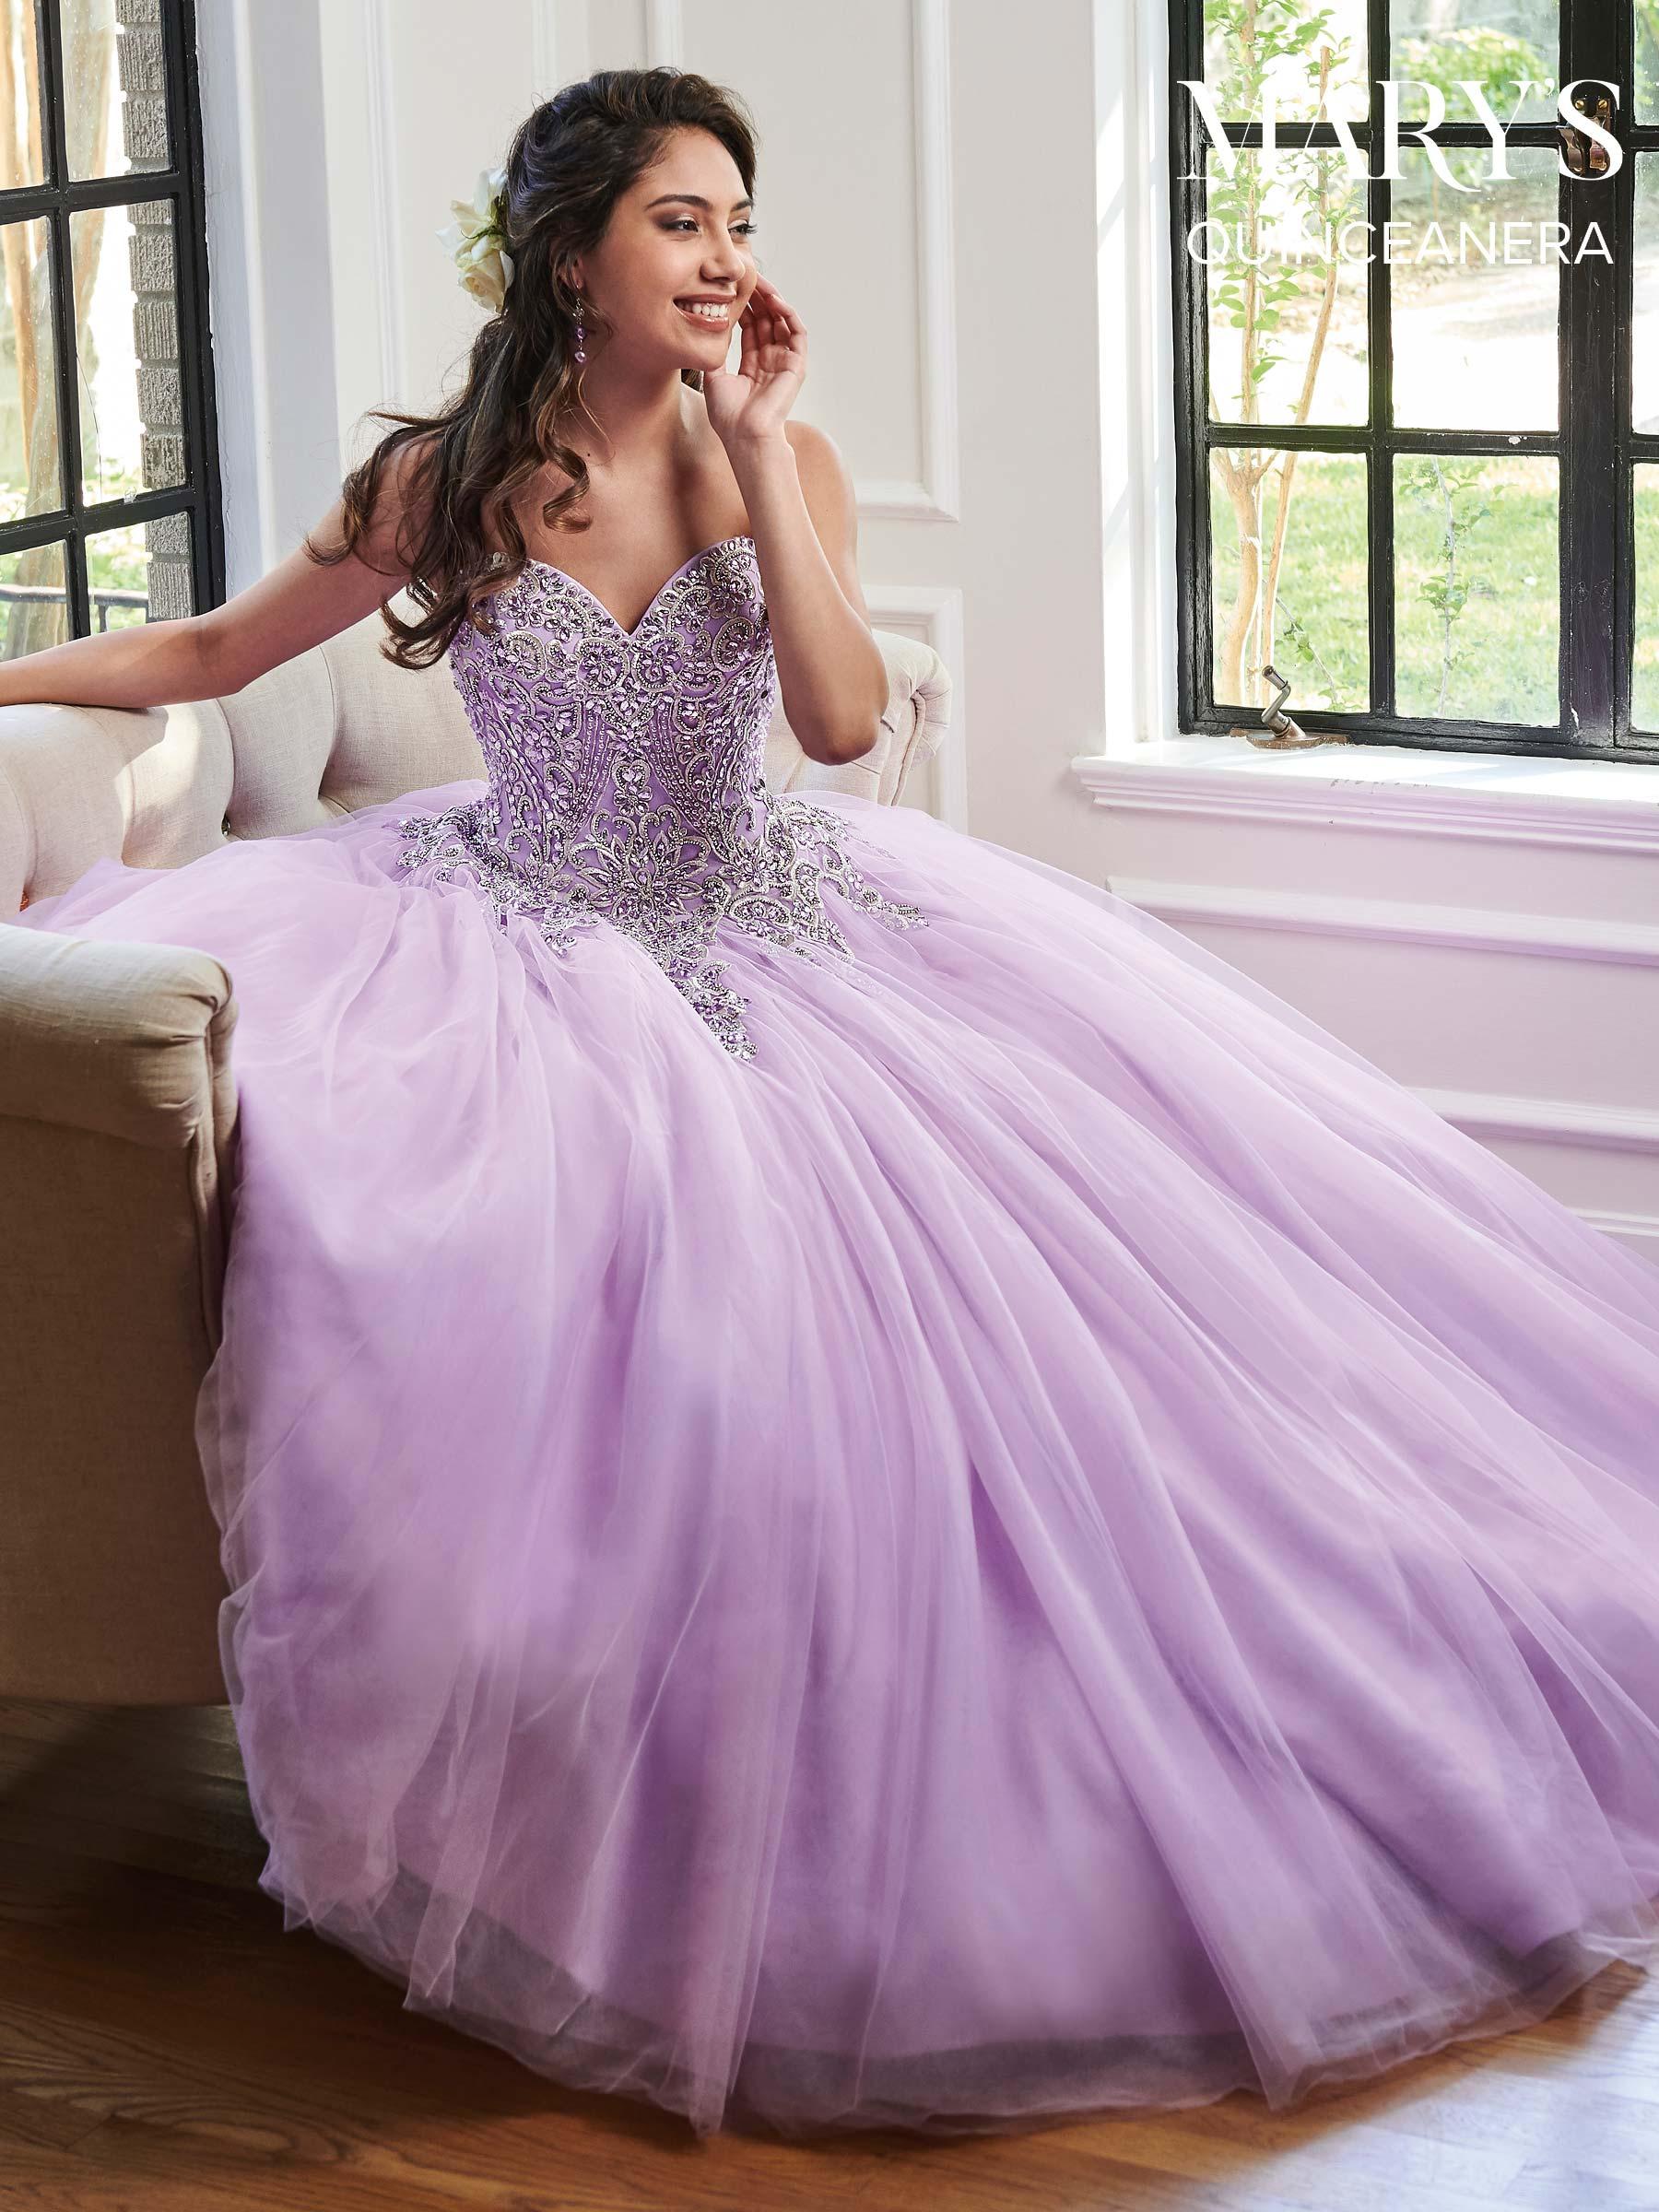 4461fdb204 Marys Quinceanera Dresses